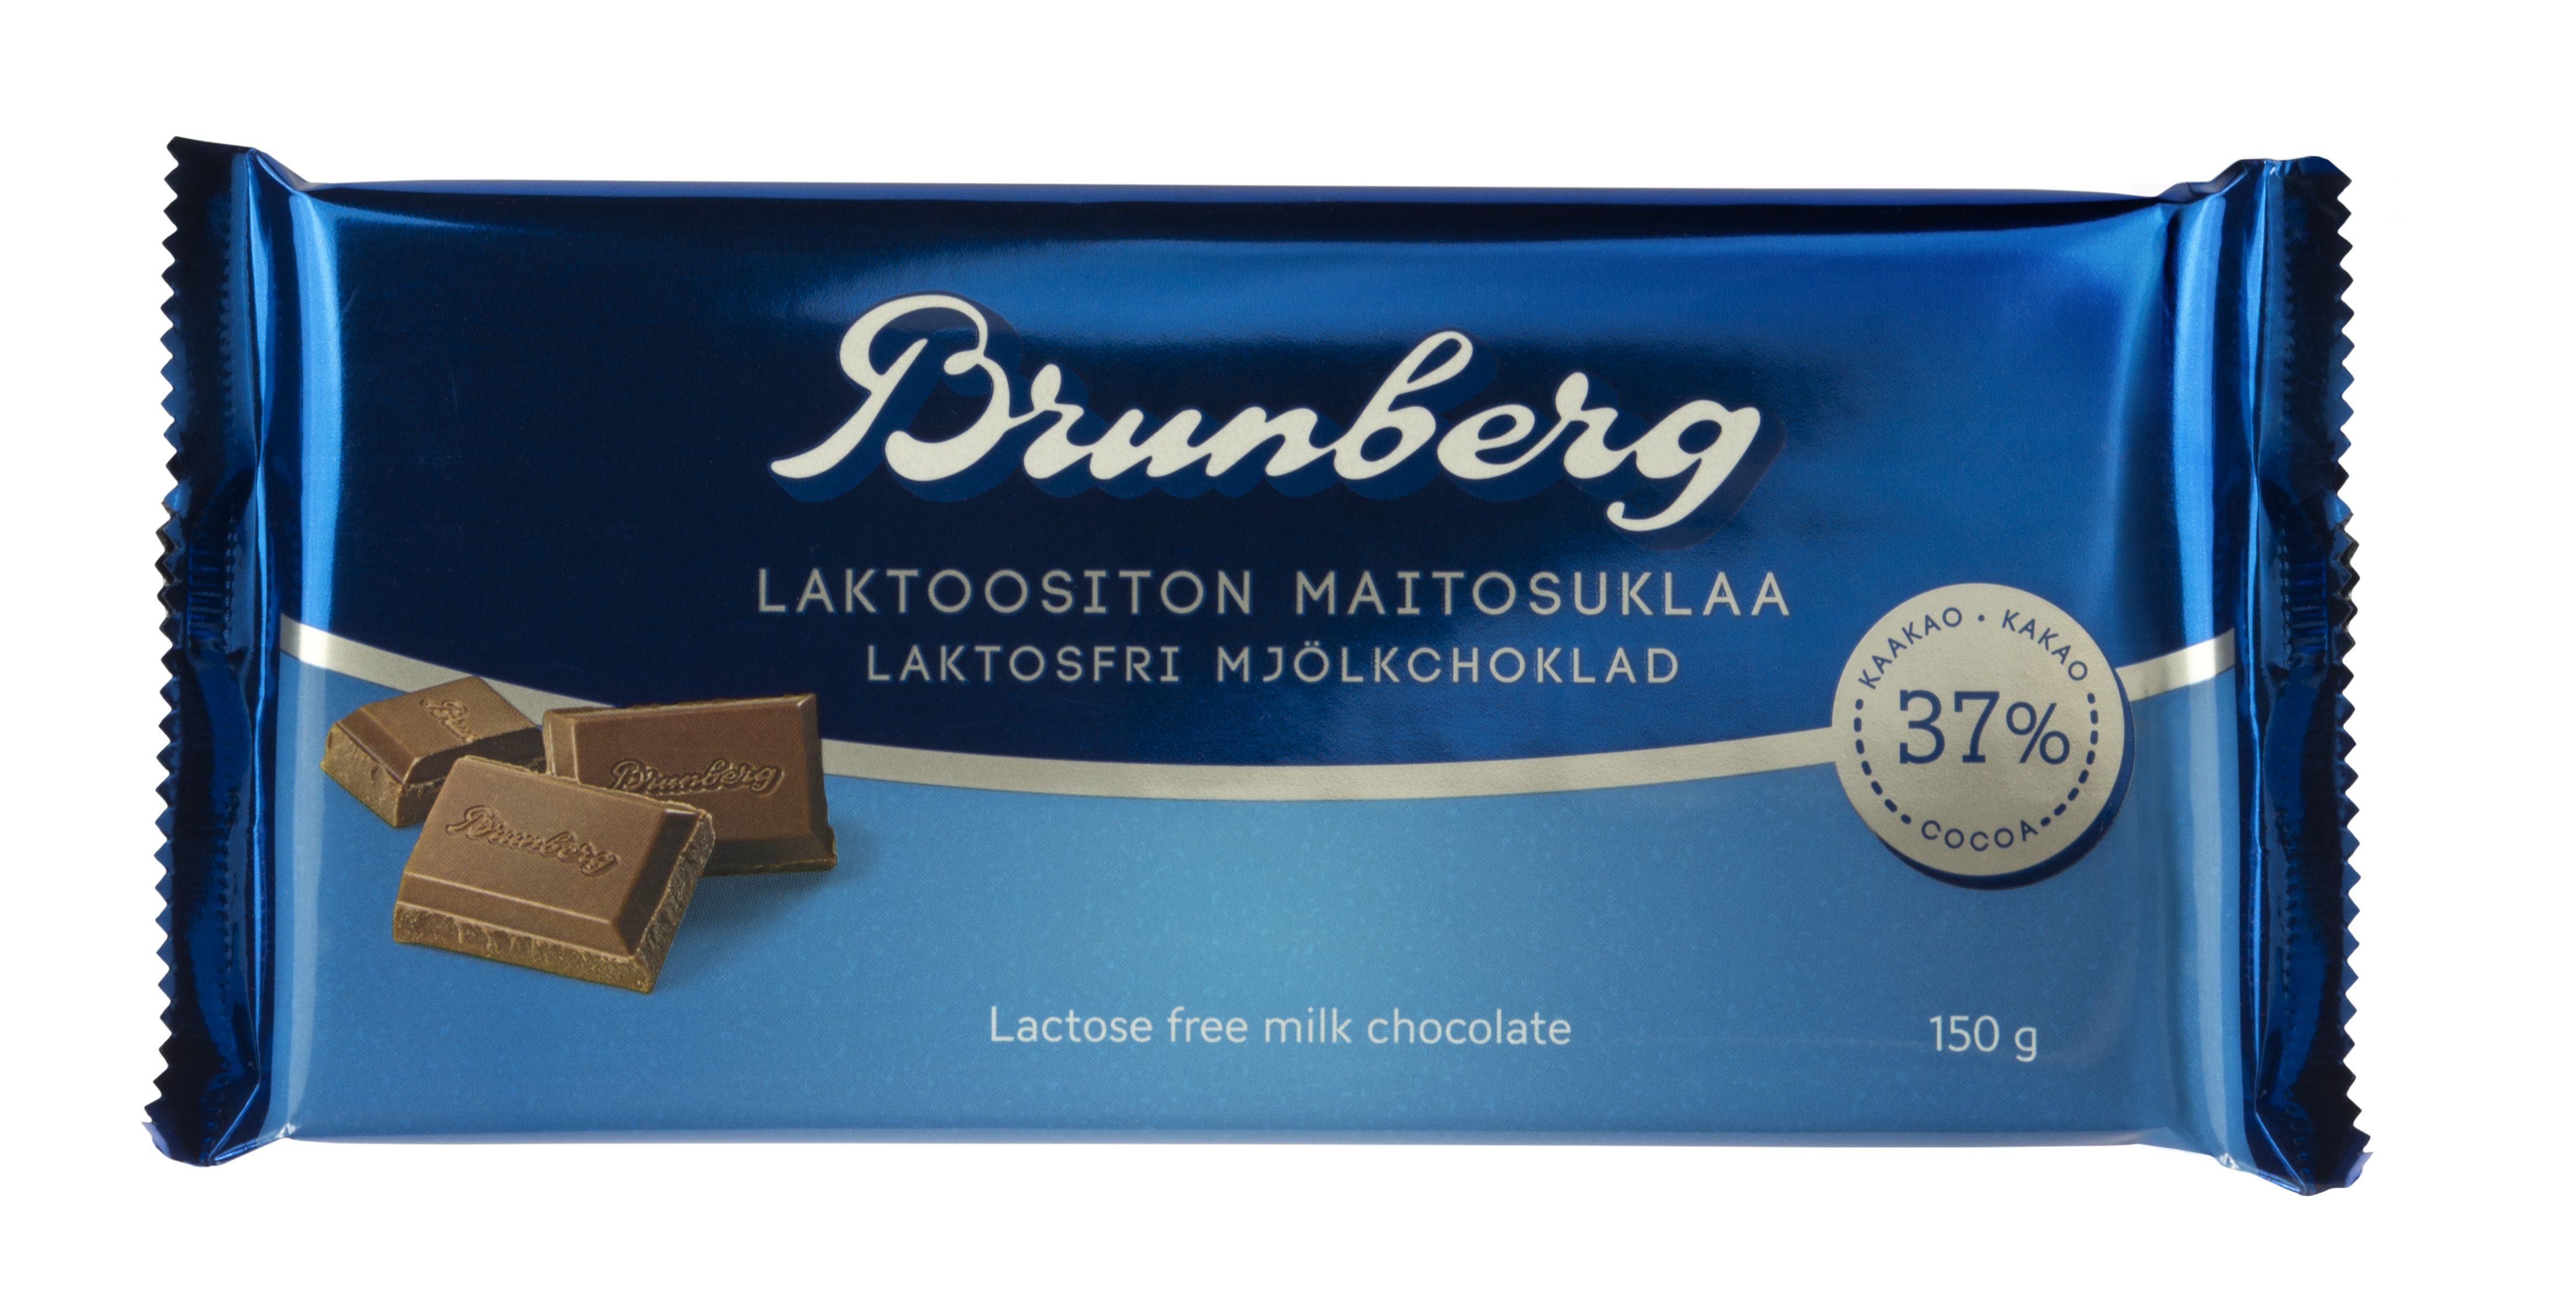 Laktoositon maitosuklaa, Brunberg